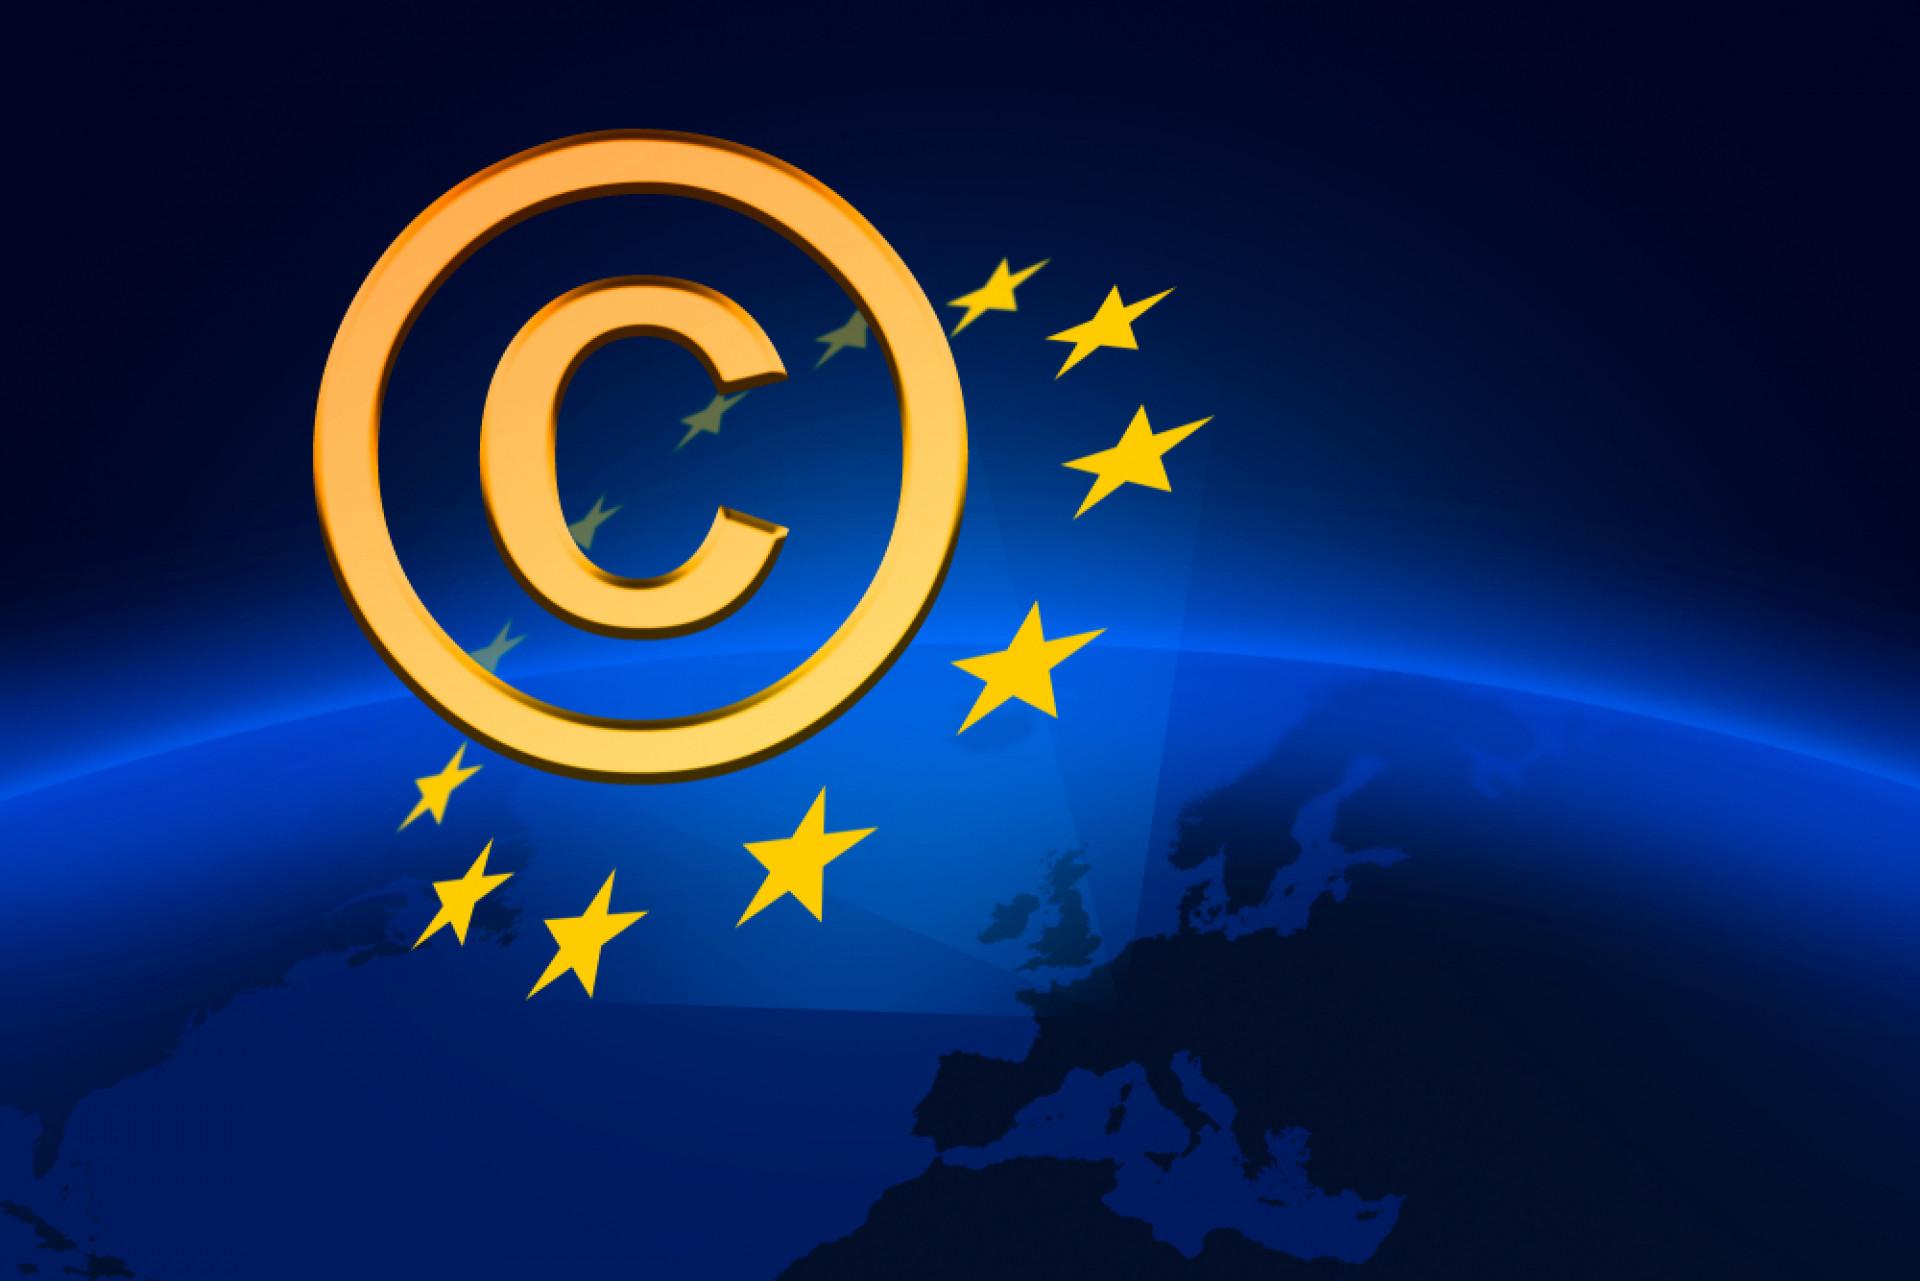 260-Organisationen-unterst-tzen-die-Urheberrechtsreform